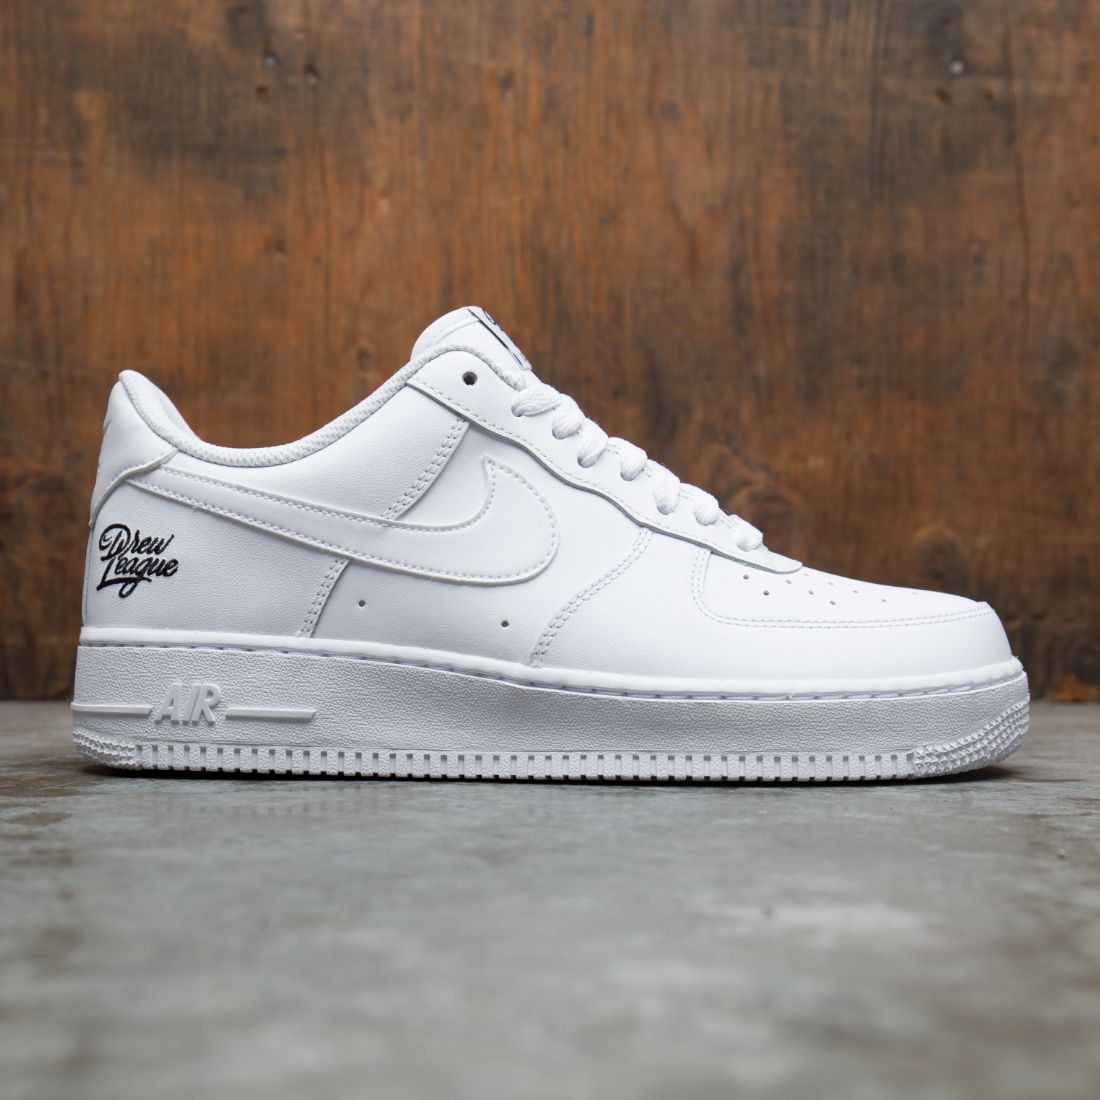 Nike Men Air Force 1 '07 Lv8 (white / white-black)